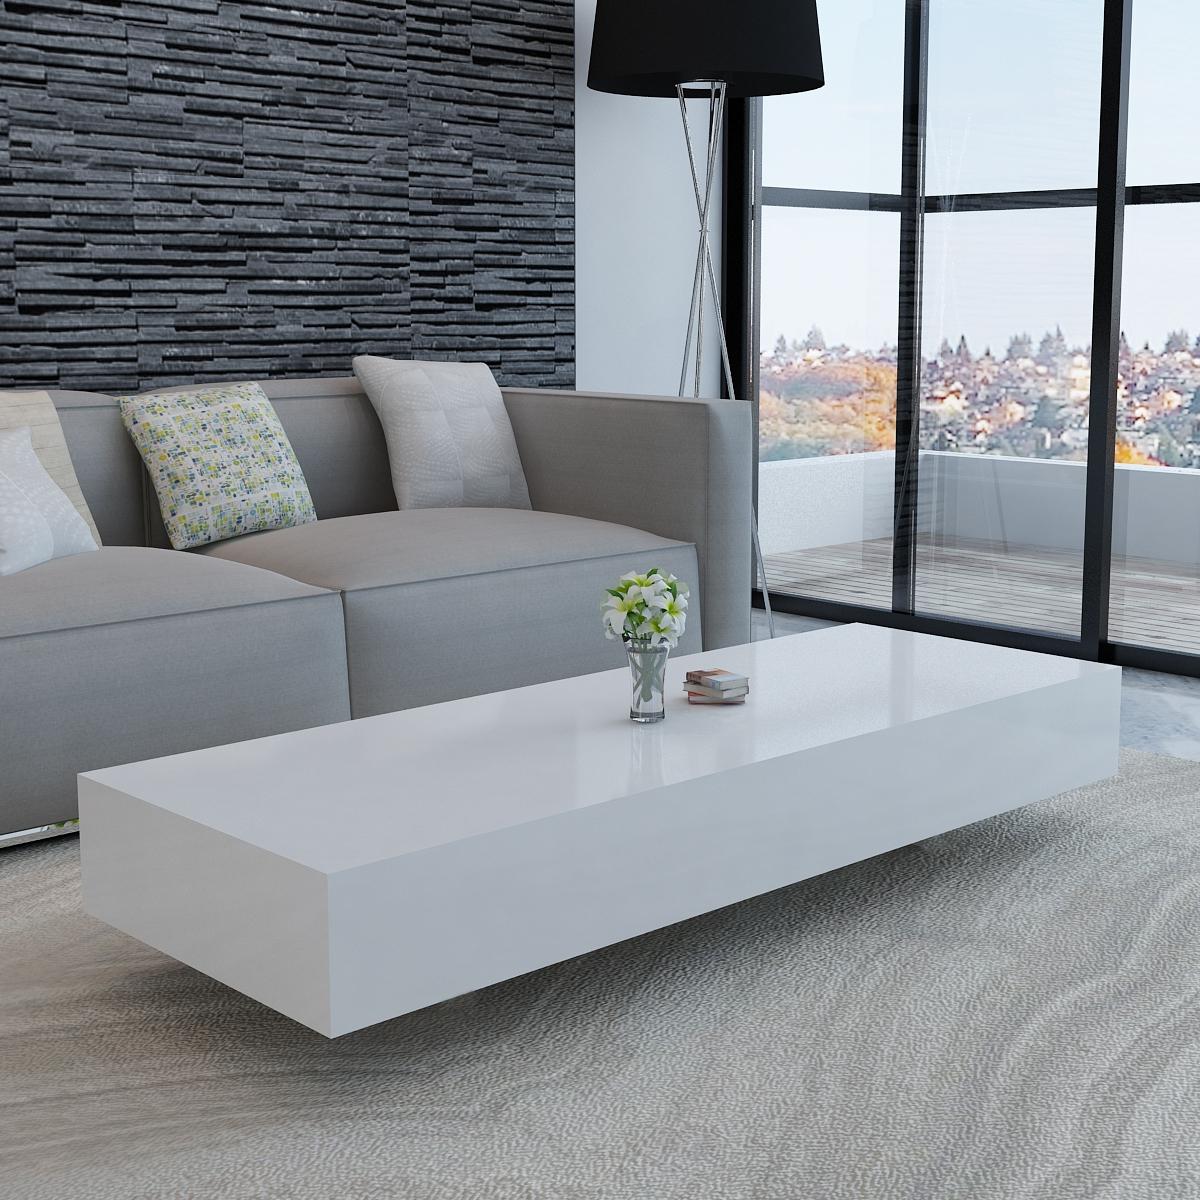 Ikea Table White 2021